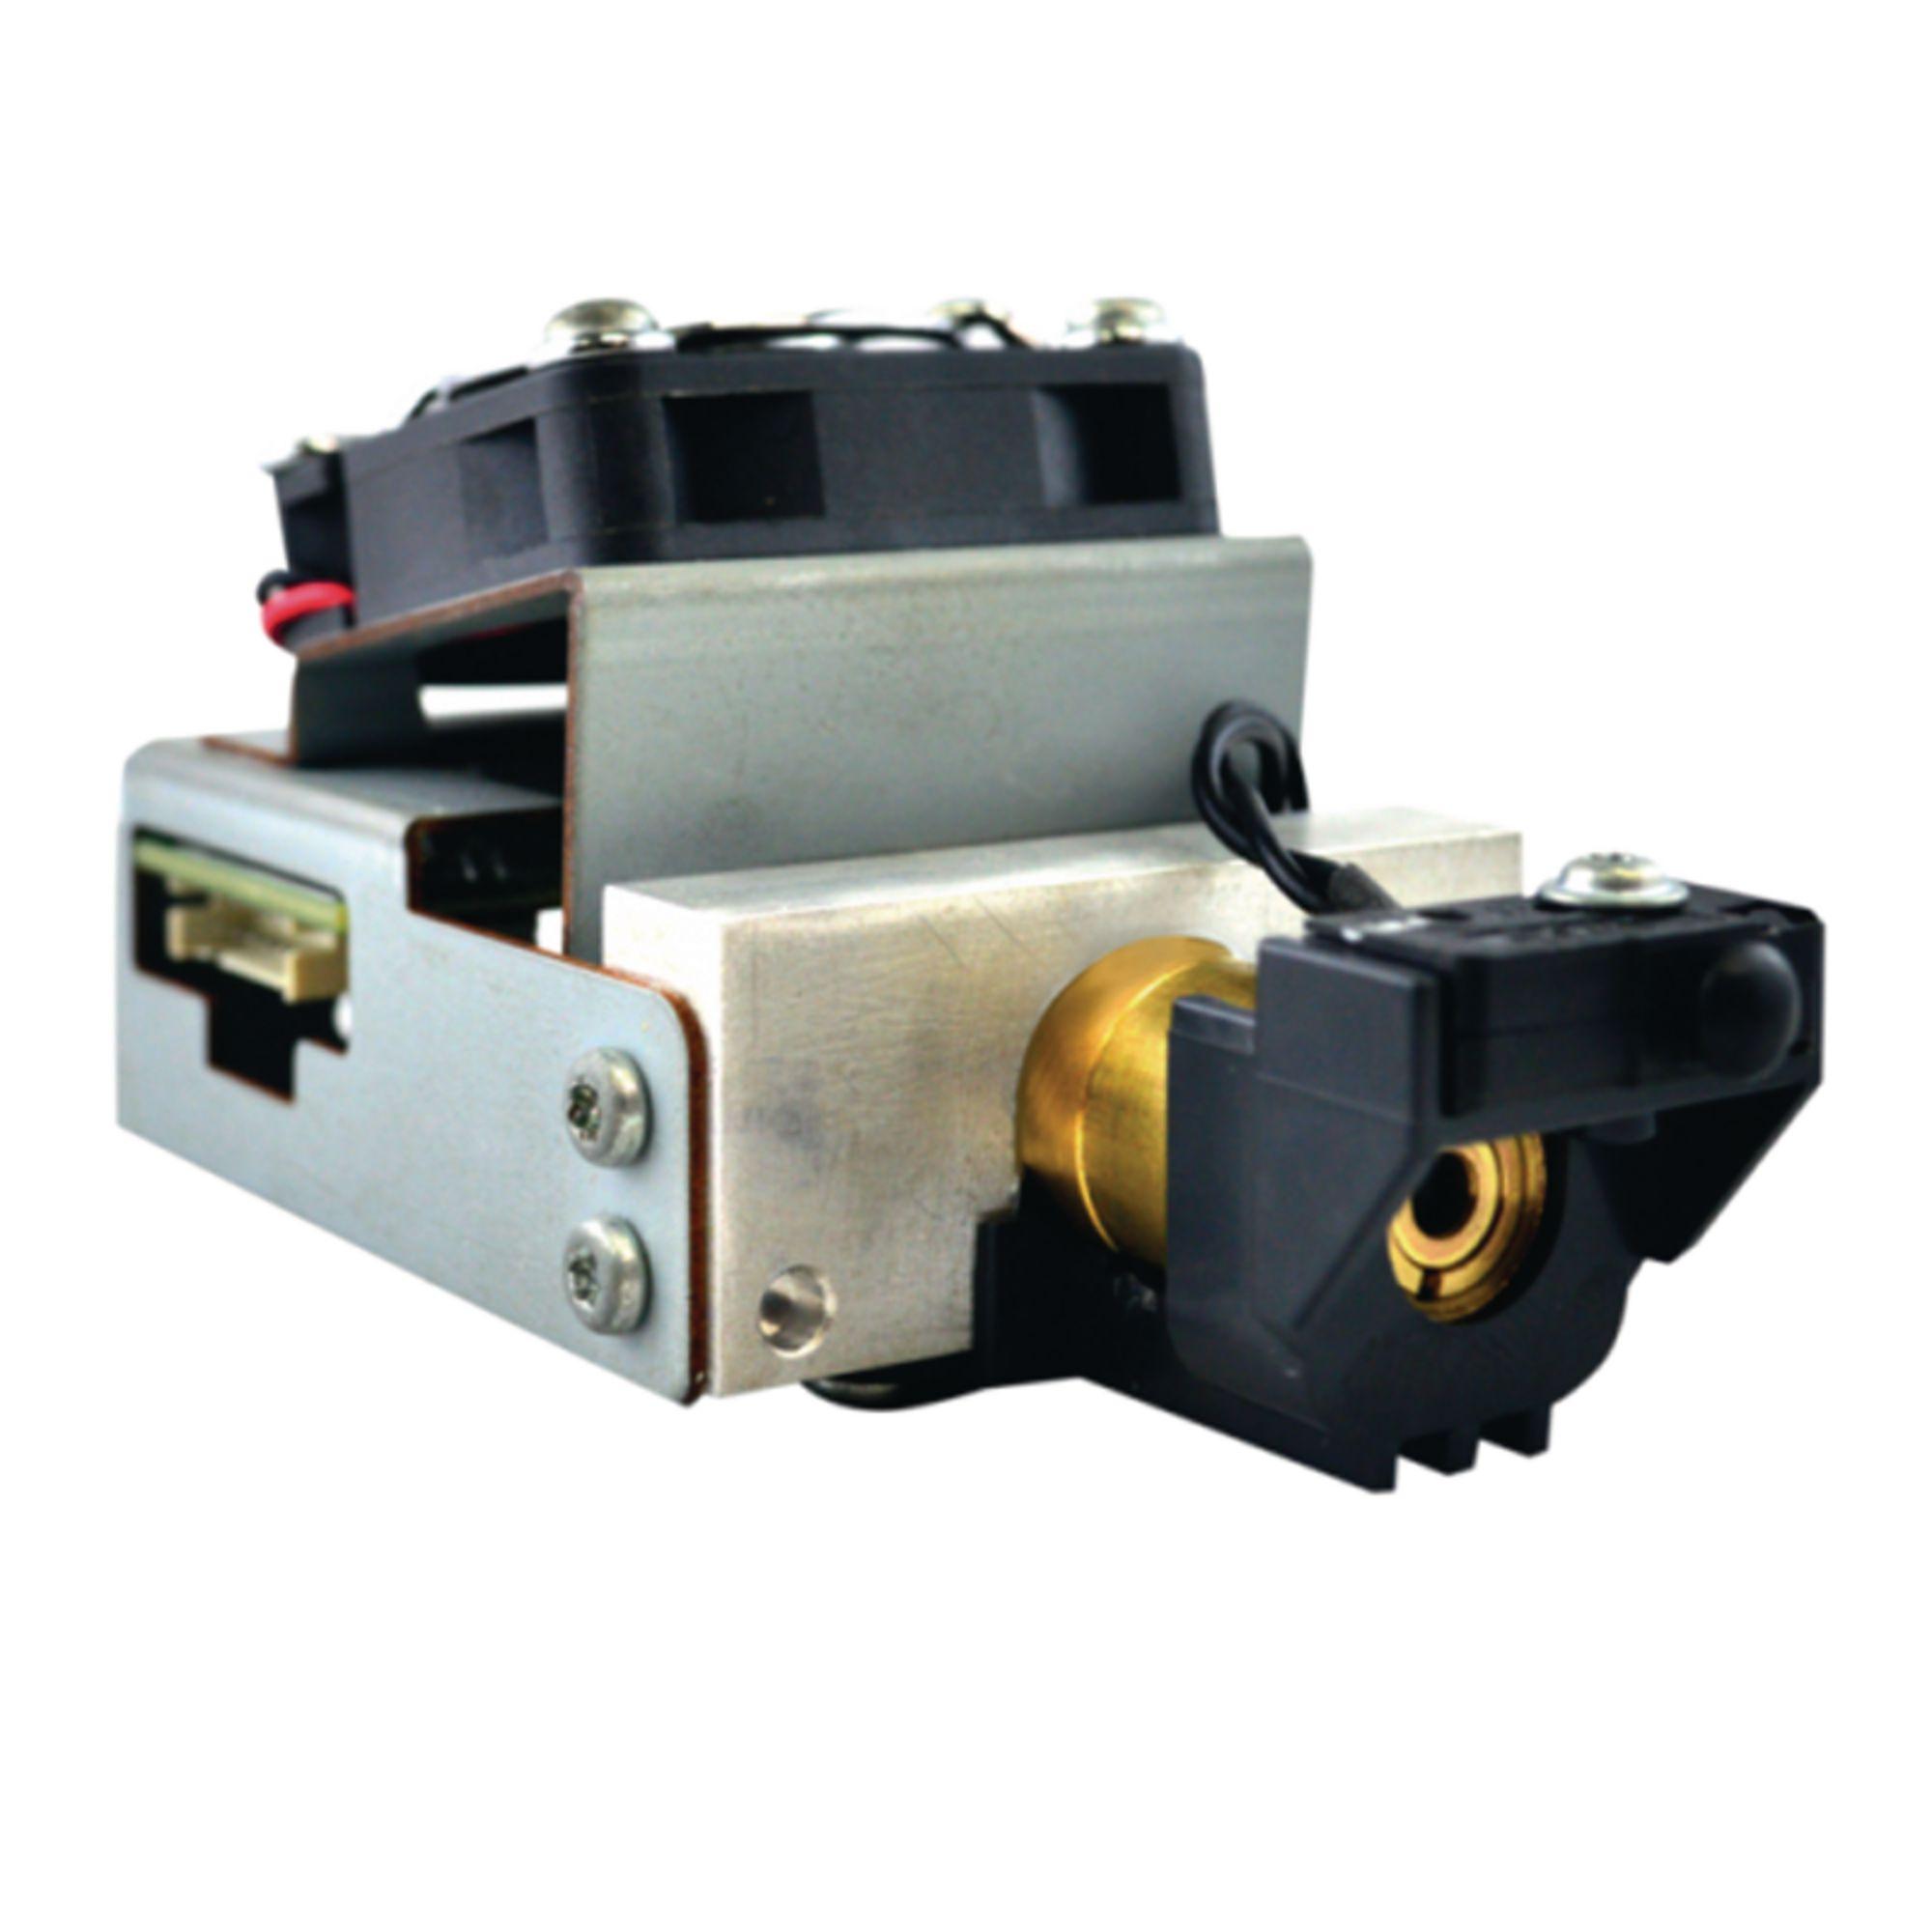 Da Vinci 1 0 Pro Laser Engraver Module Philip Harris